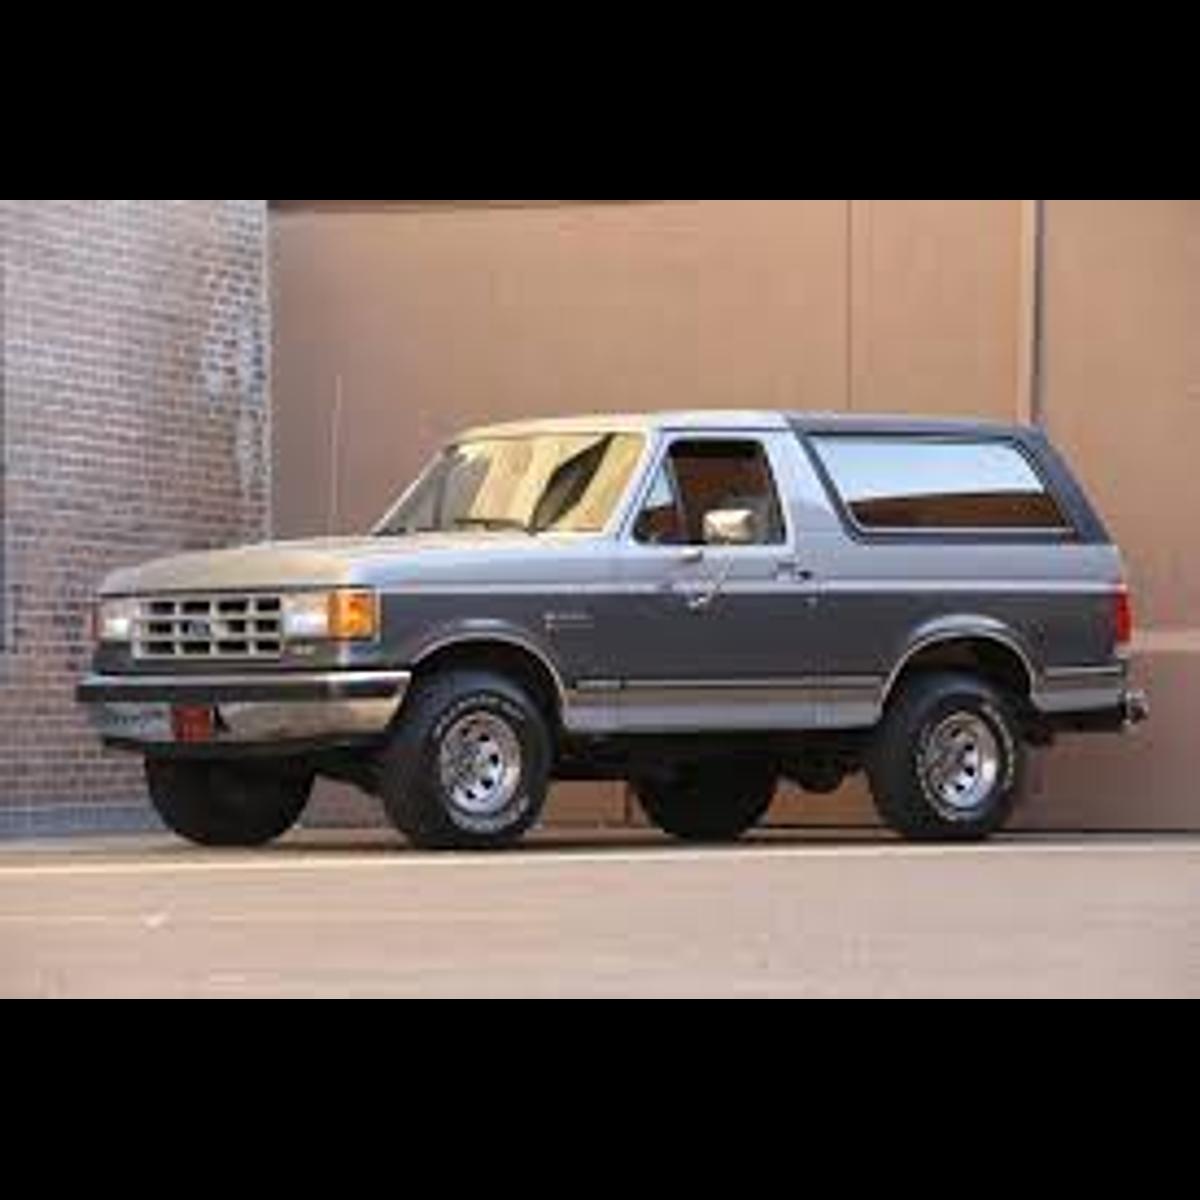 Manual De Taller Ford Bronco Ii (1983-1990) Español